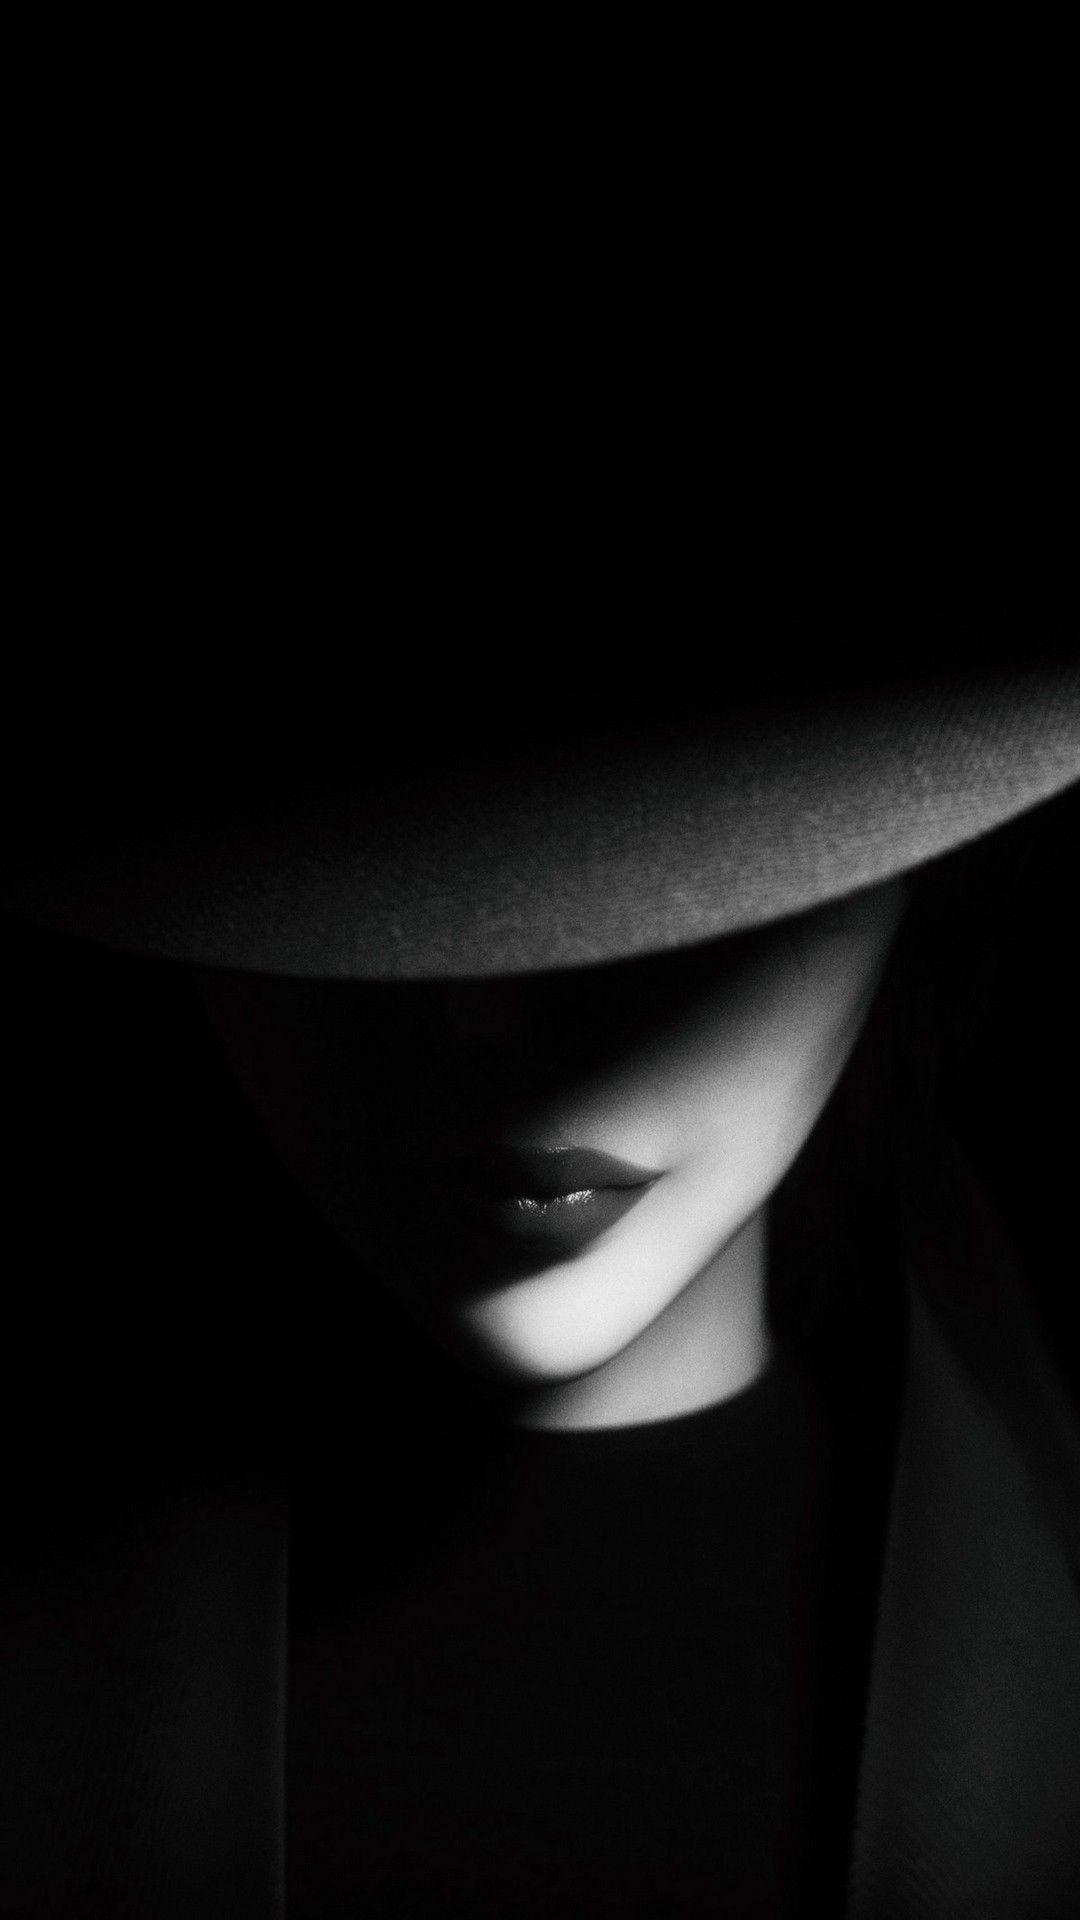 Muchatsable Black And White Portraits Dark Photography Low Key Portraits